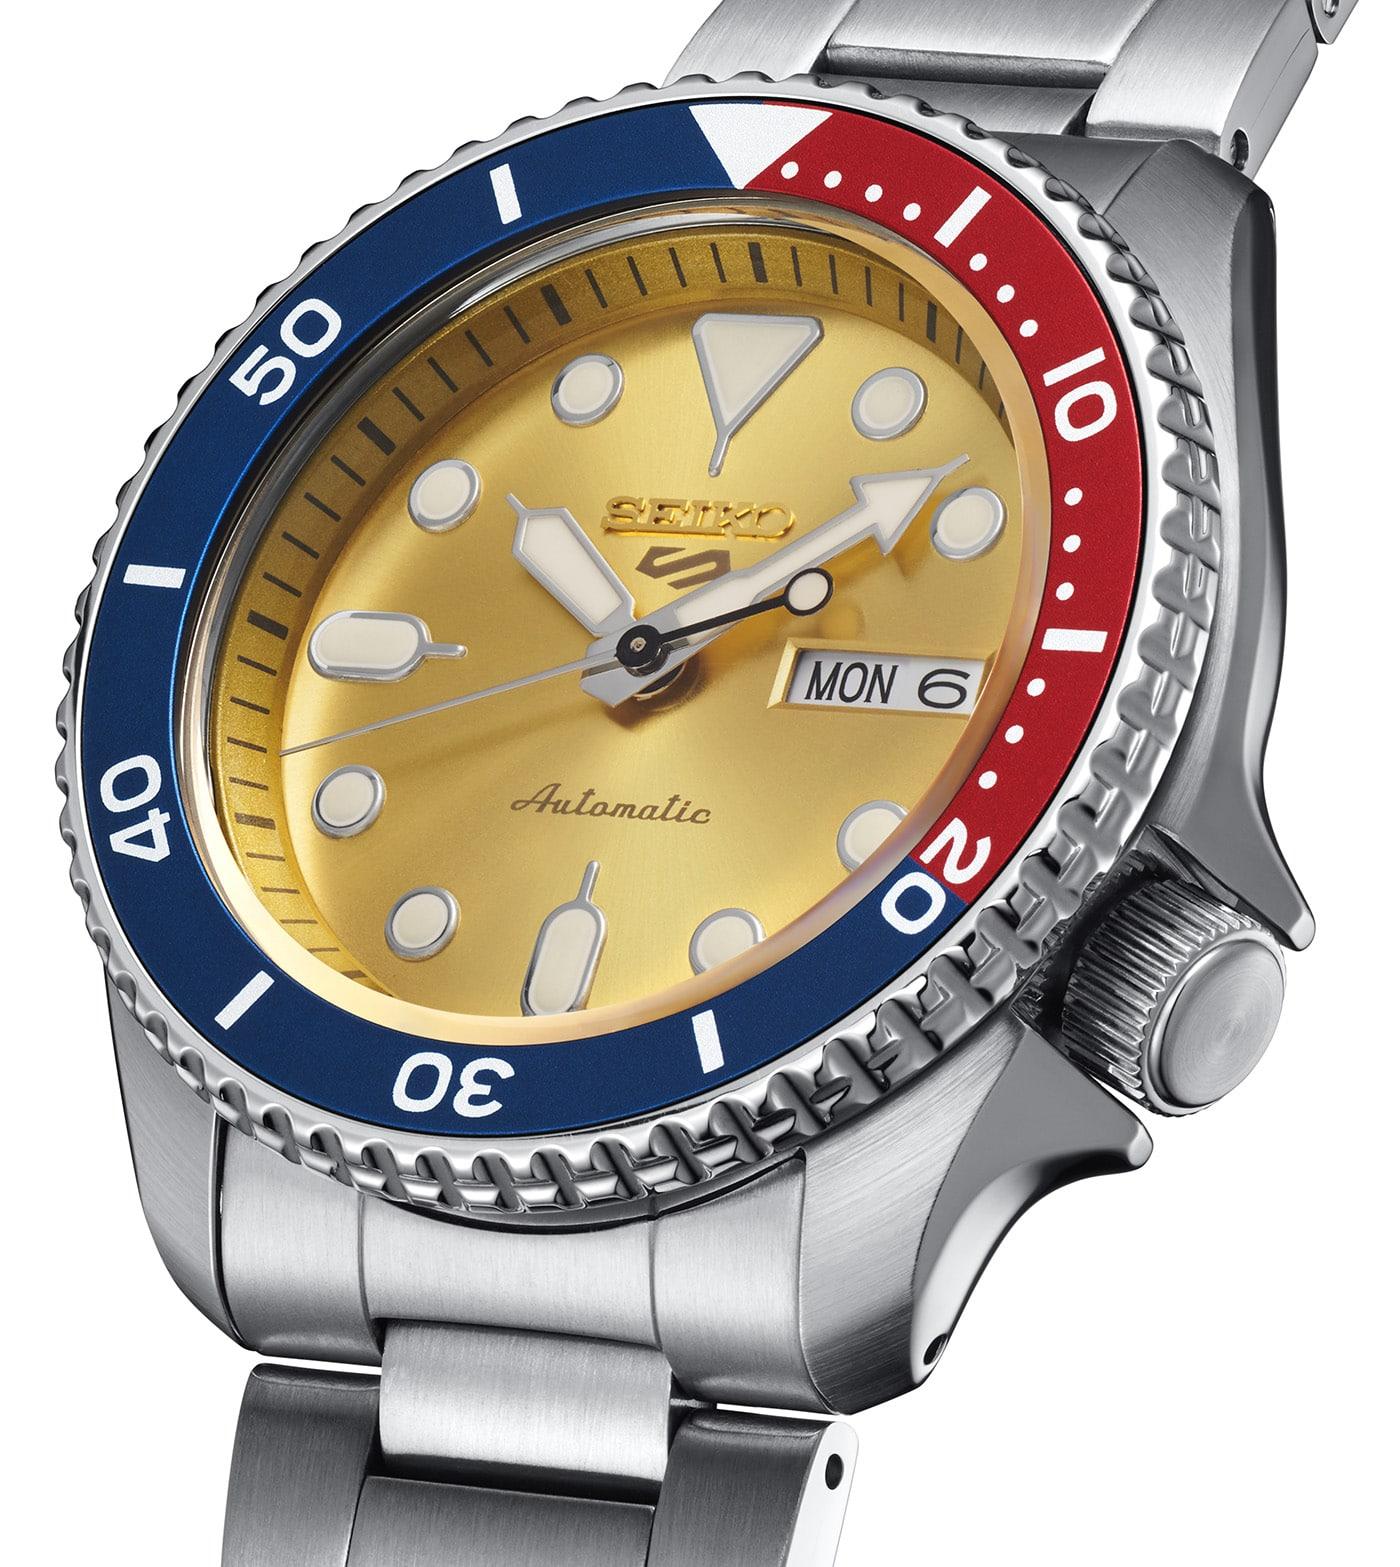 Seiko 5 Sports Custom Watch Beatmaker 2021 Limited Edition 2 min